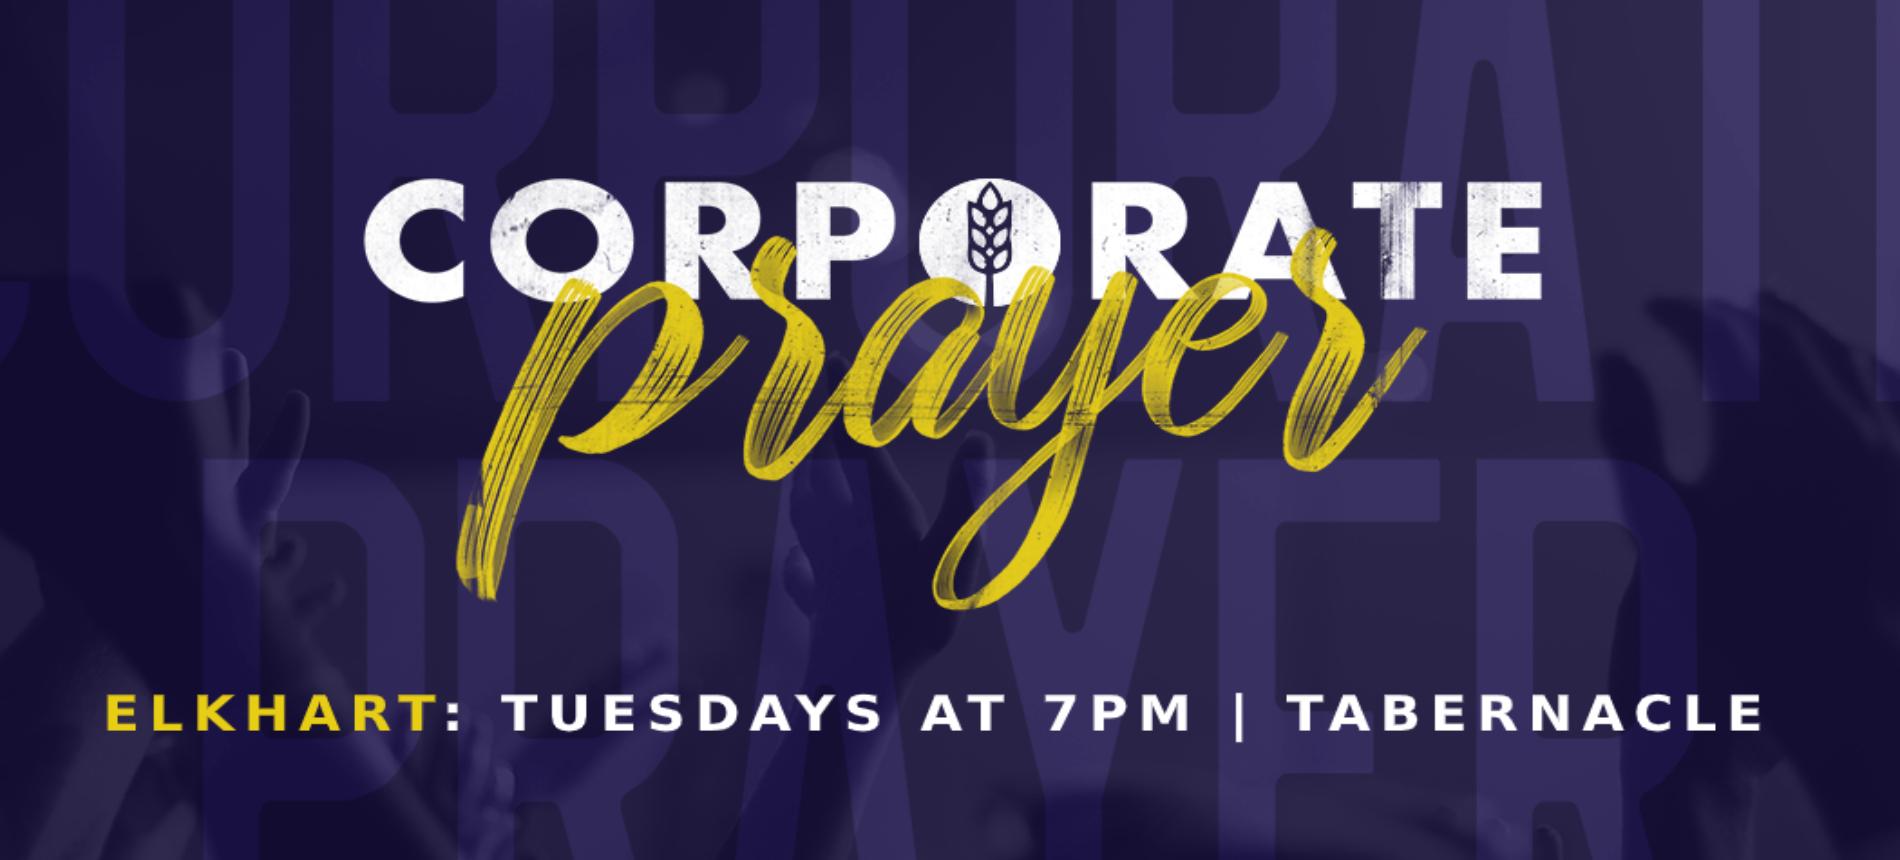 WHCE | Corporate Prayer Updated